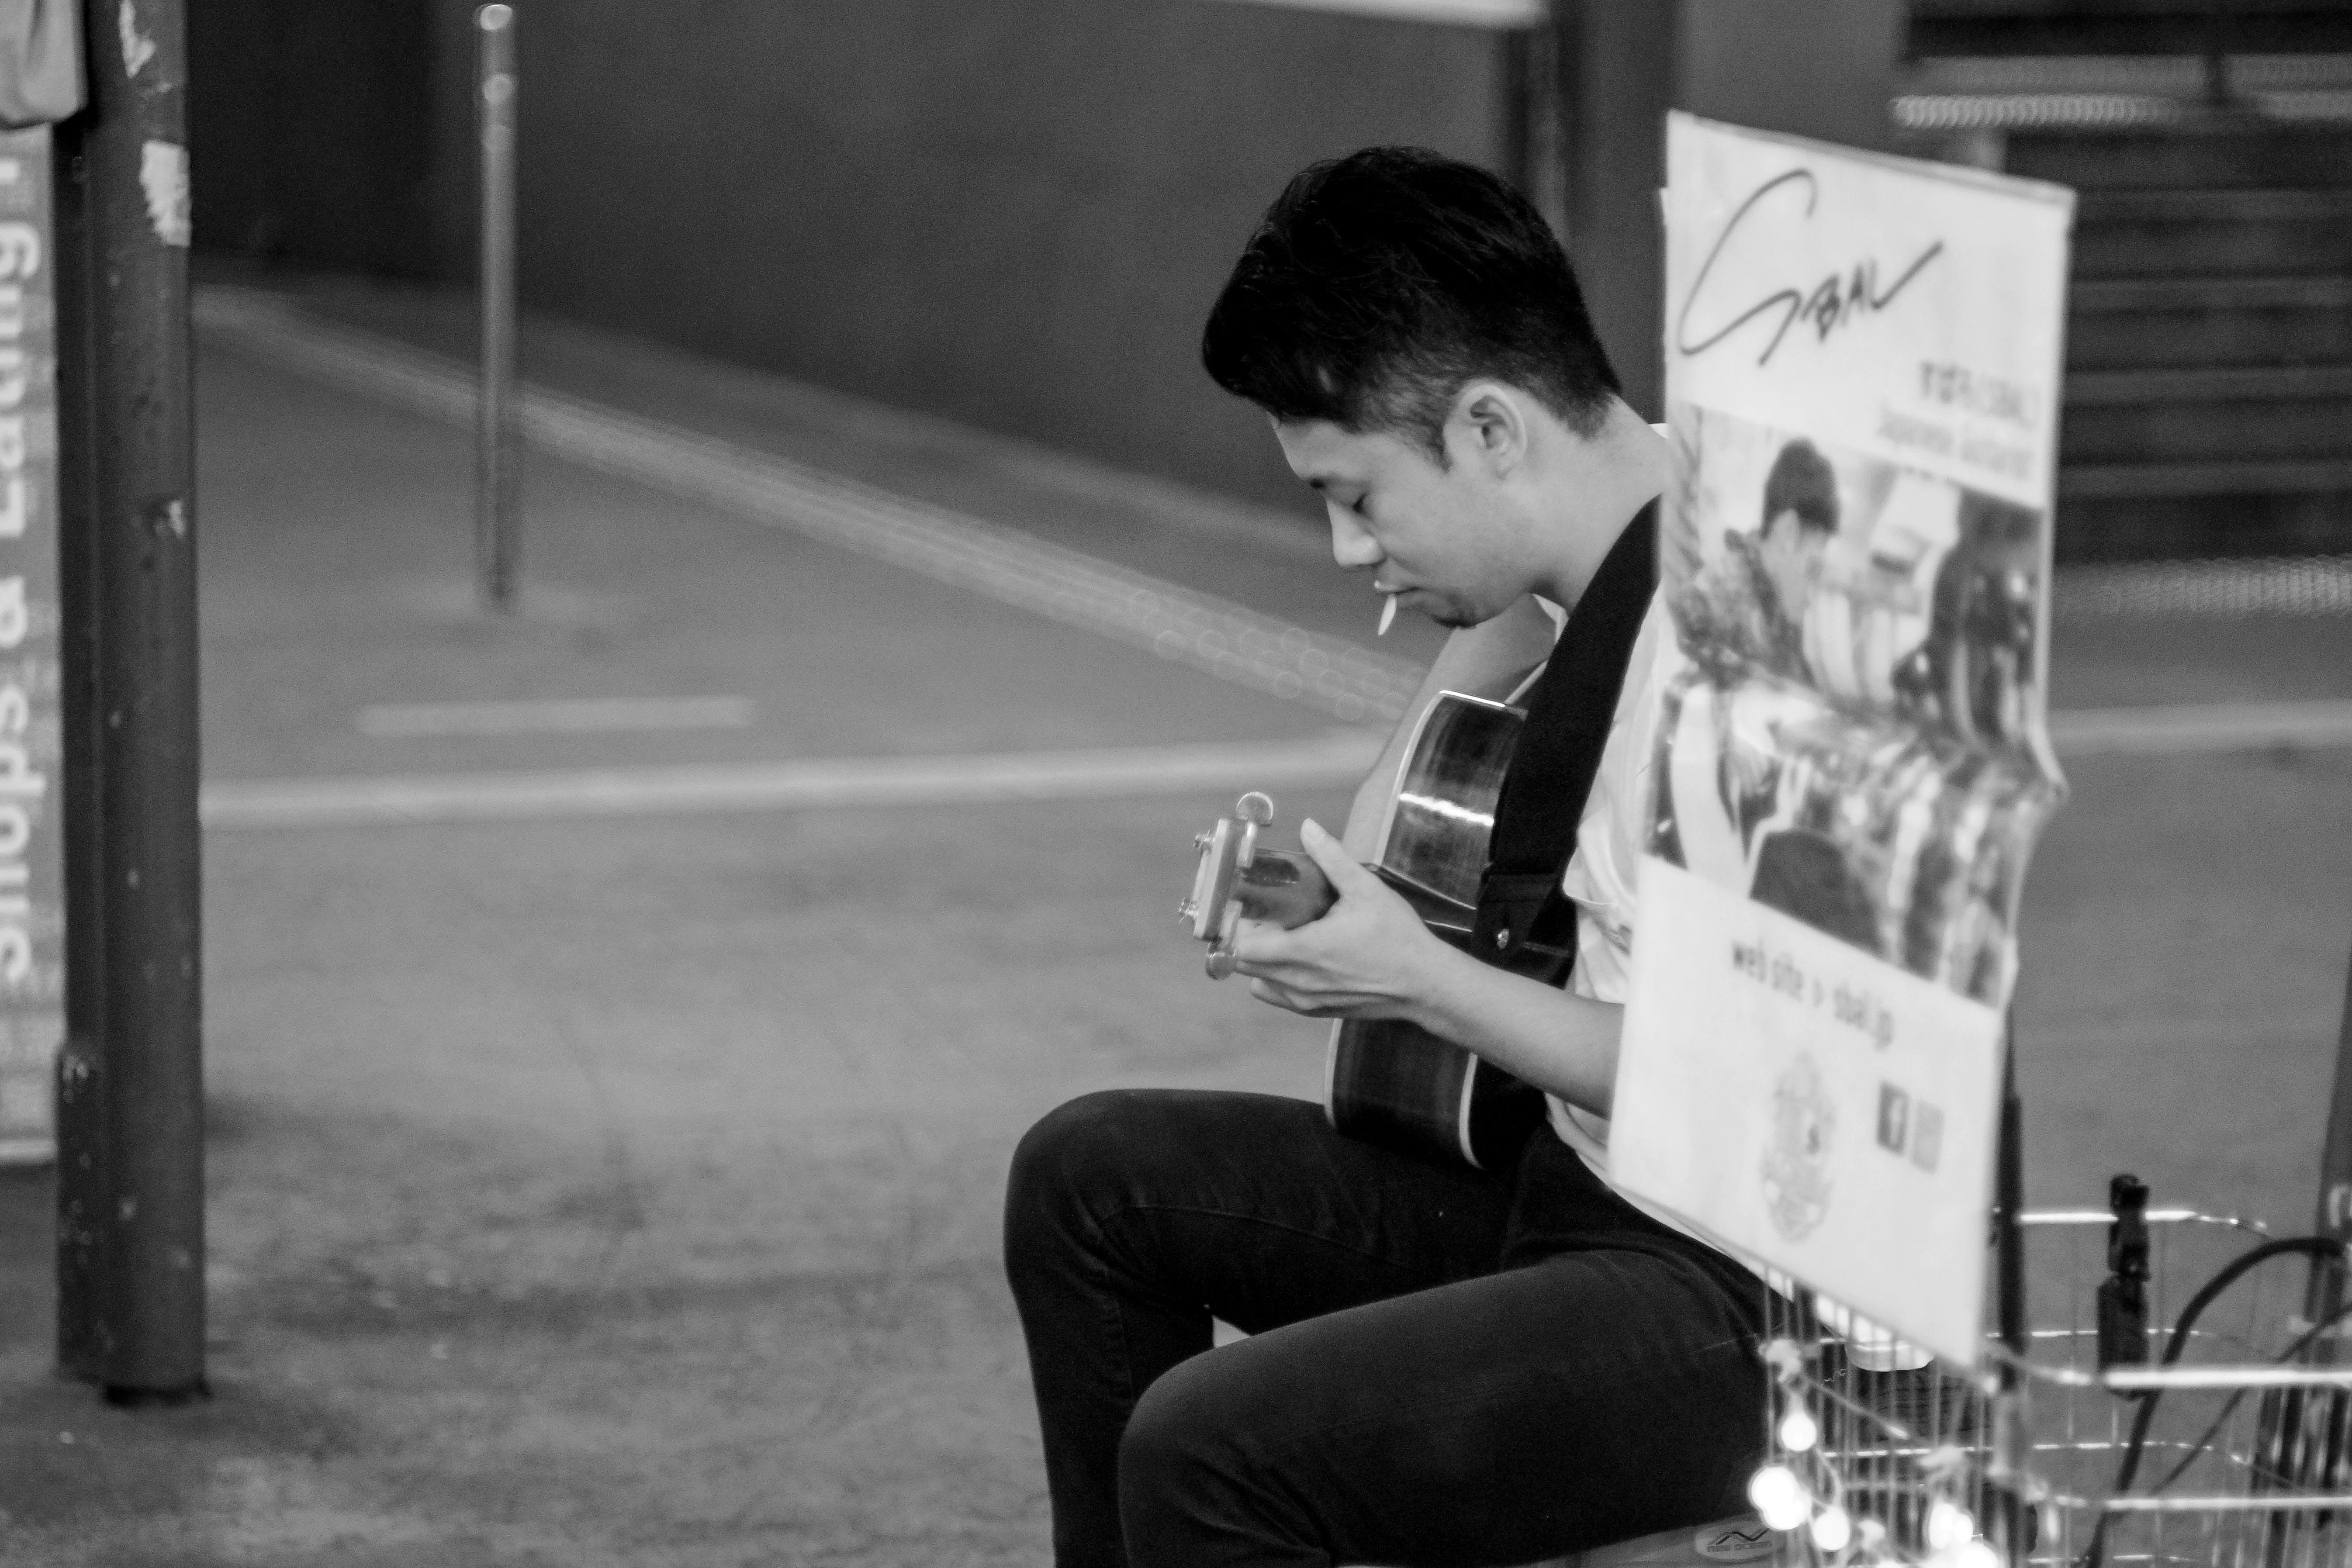 černobílá, černobílý, hudebník